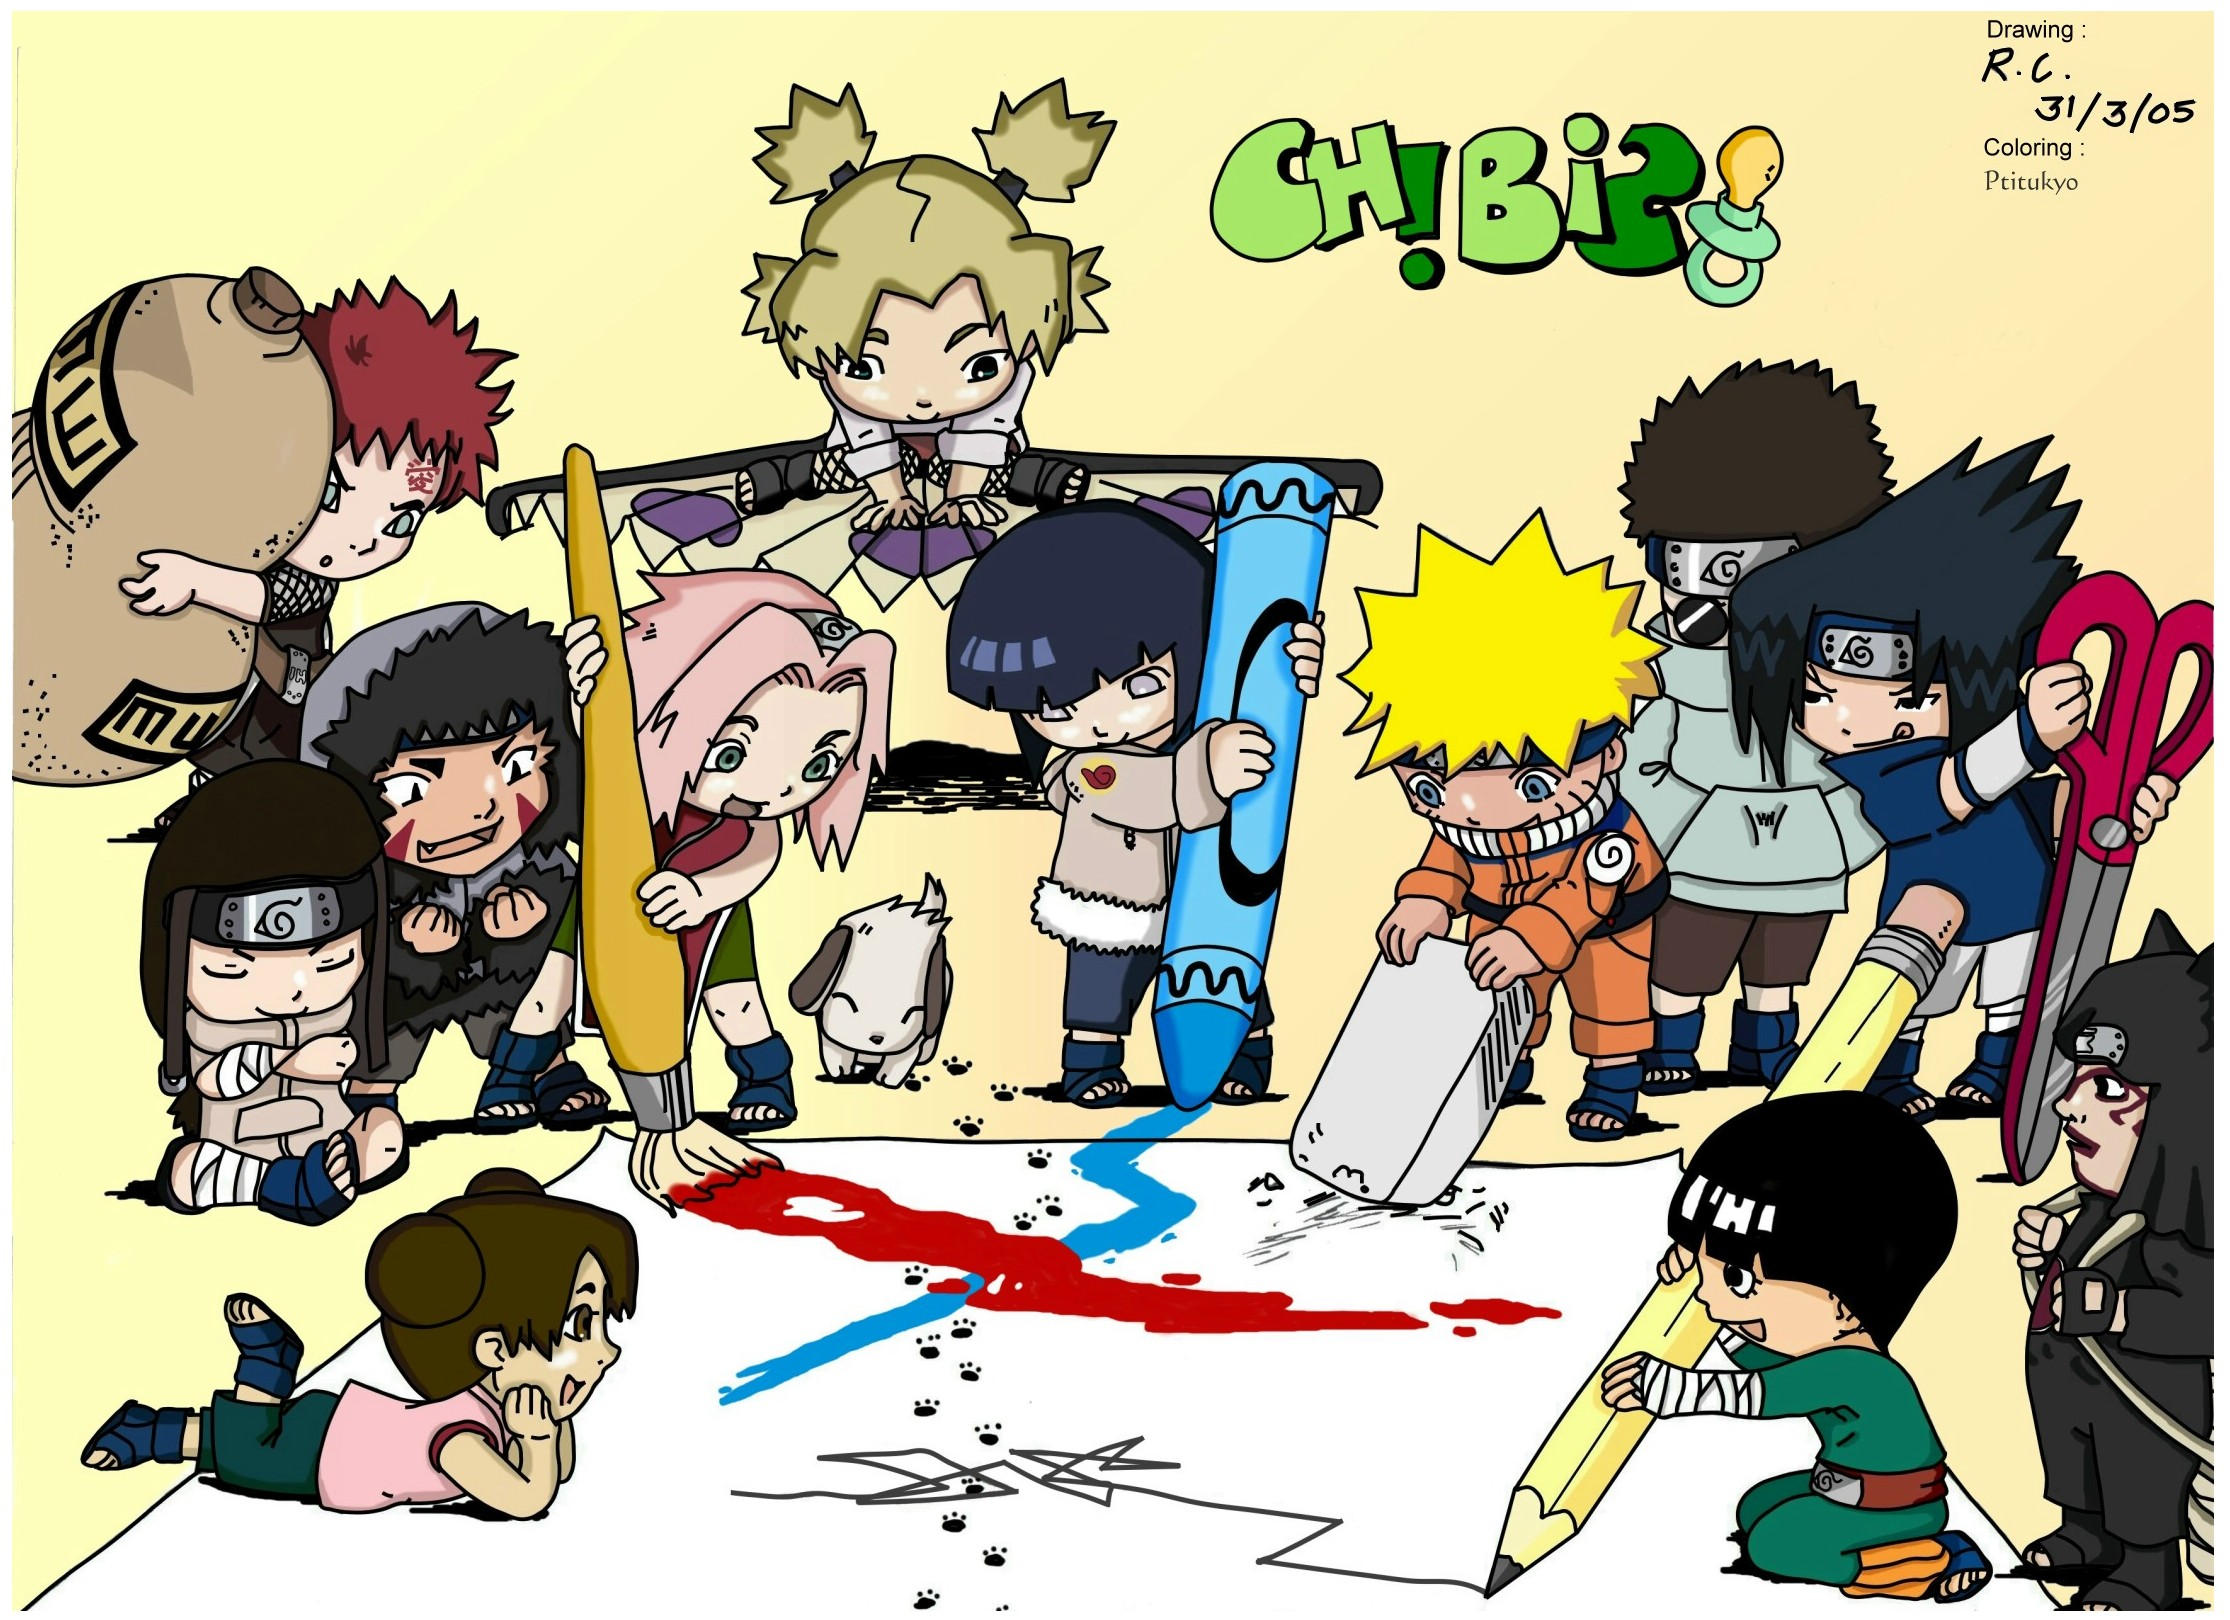 http://fc05.deviantart.com/fs4/i/2005/137/7/f/Collab___Naruto_Chibis_by_Ptitukyo.jpg